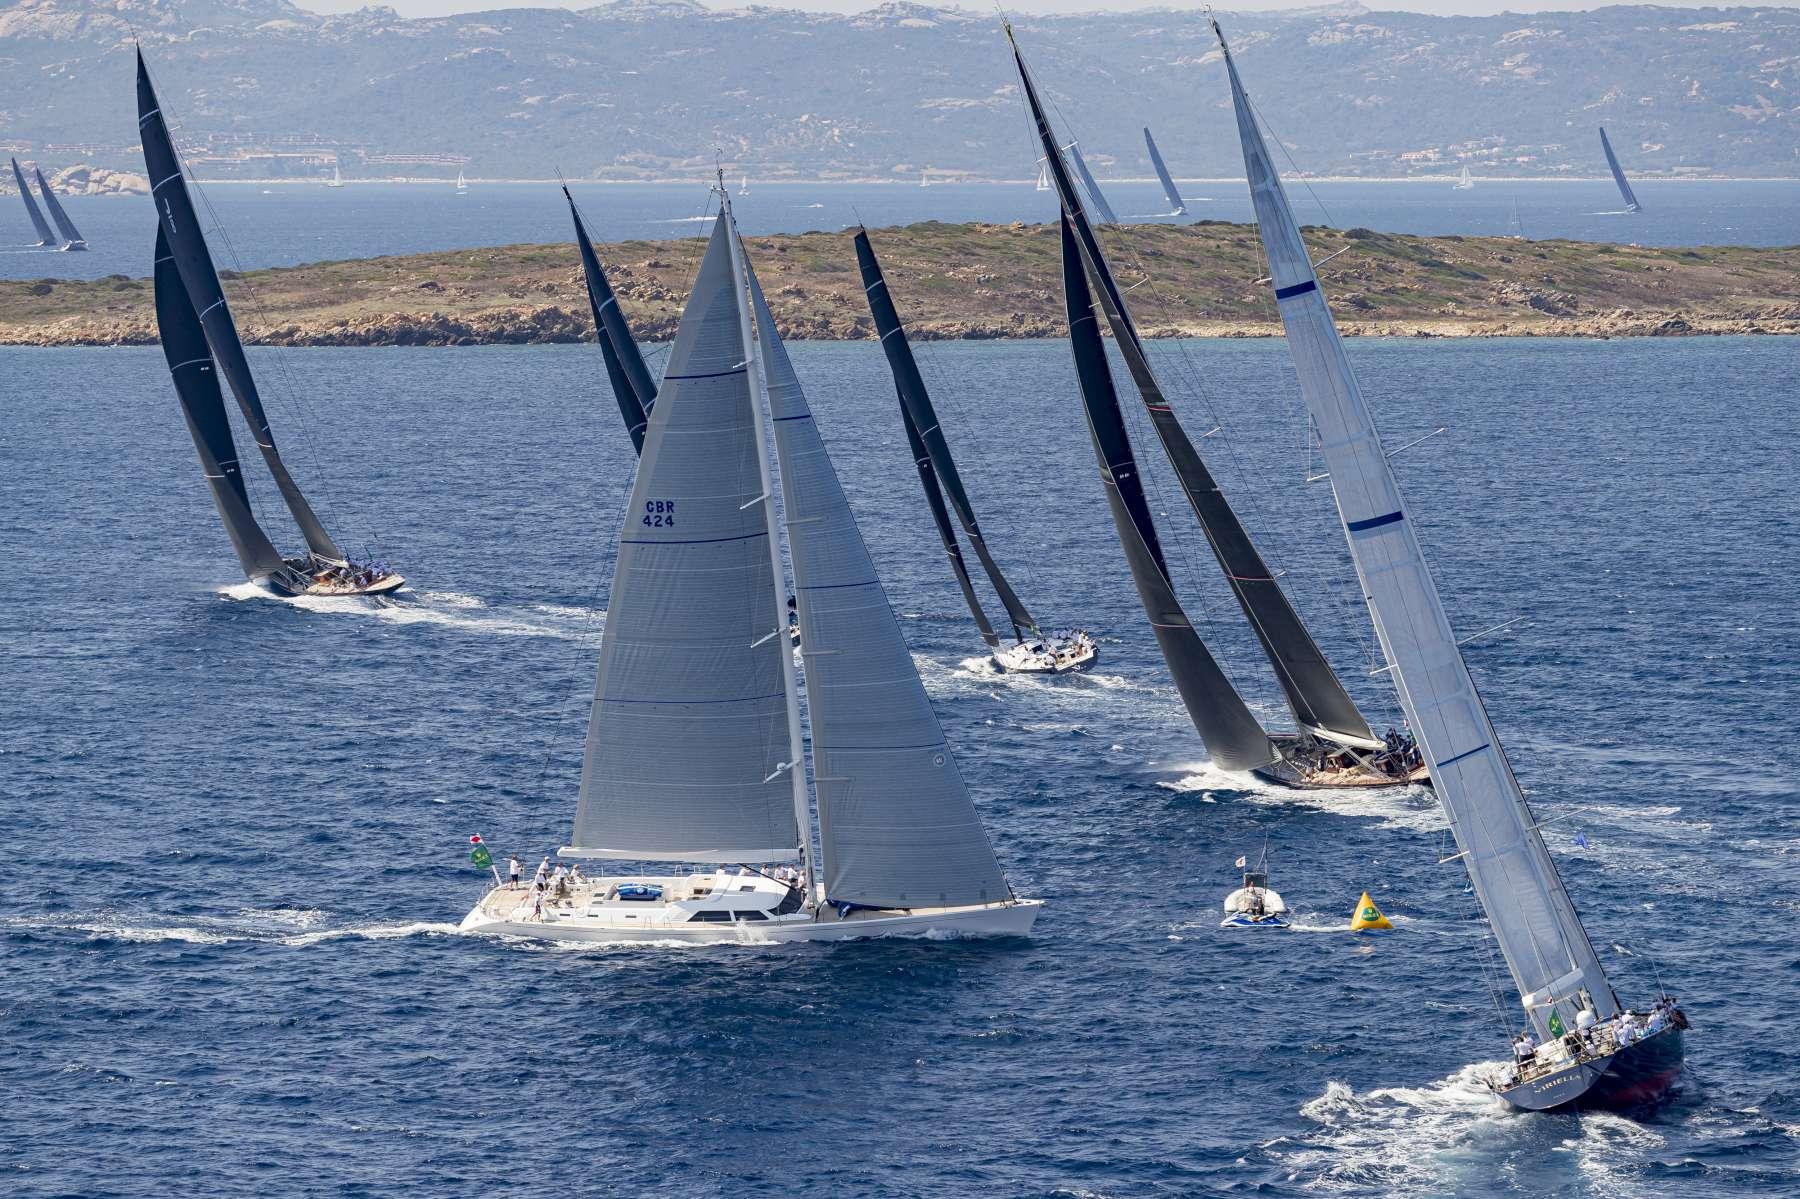 MAXI YACHT ROLEX CUP 2019 - FOTO DAY 1 ONLINE - NEWS - Yacht Club Costa Smeralda